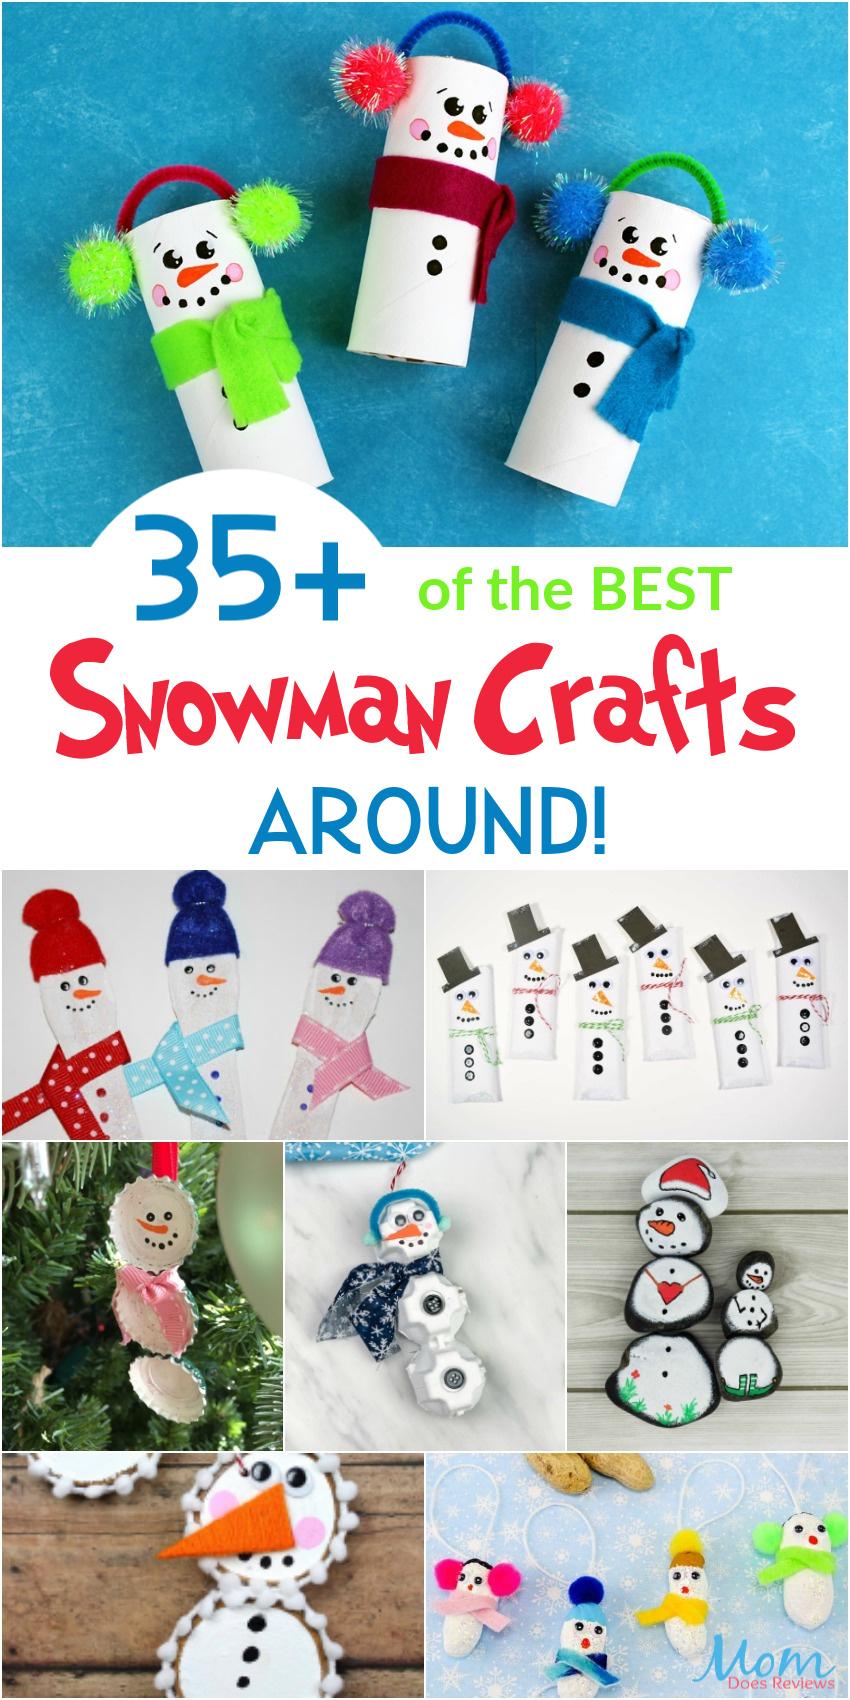 35+ of the BEST Snowman Crafts Around! #christmas #diy #wintercrafts